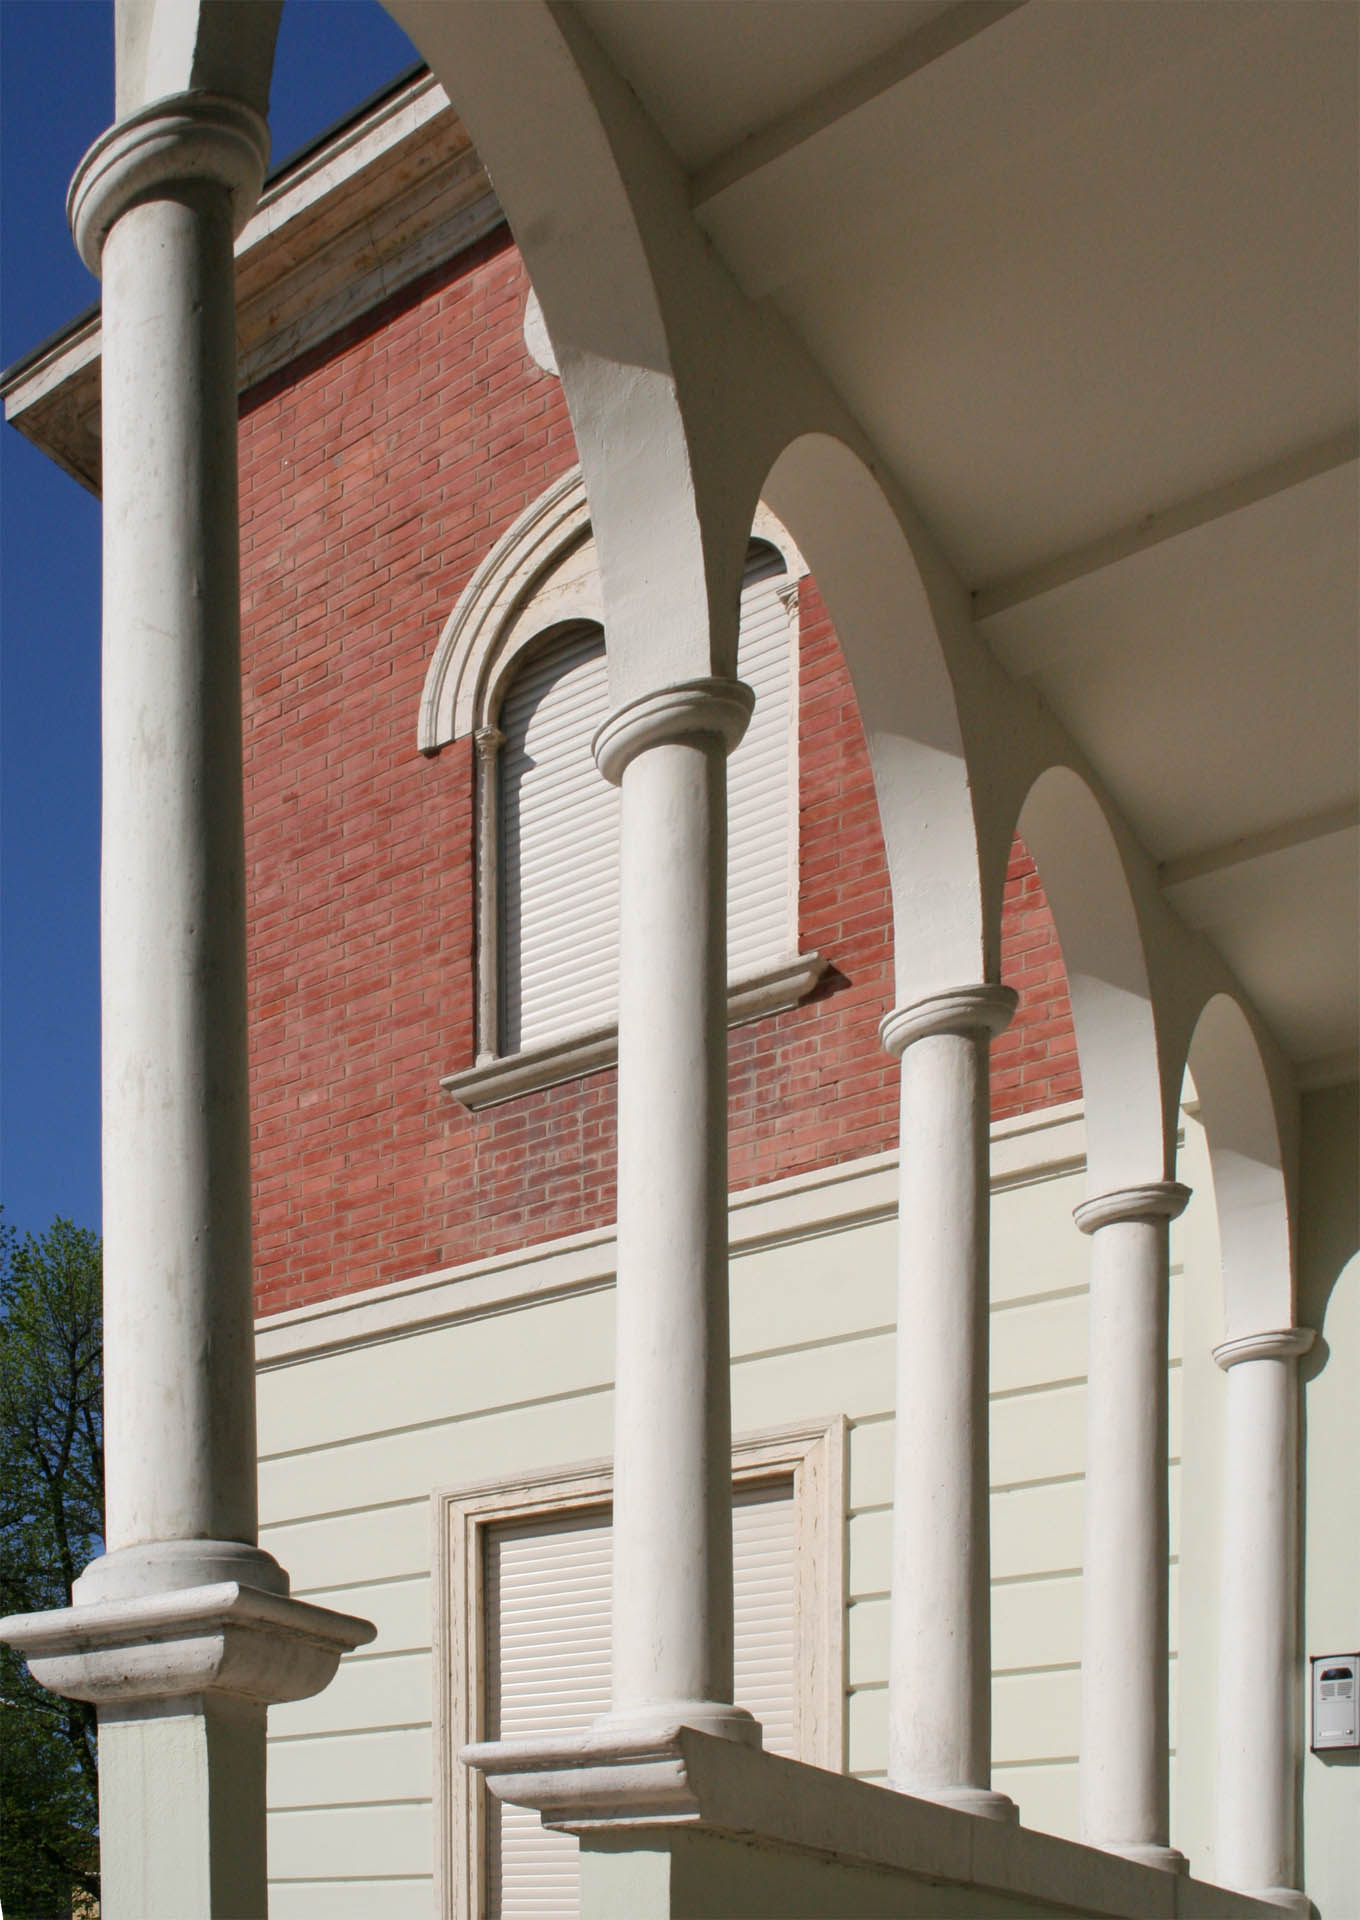 04 Studio Bacchi architetti associati Villino img 04